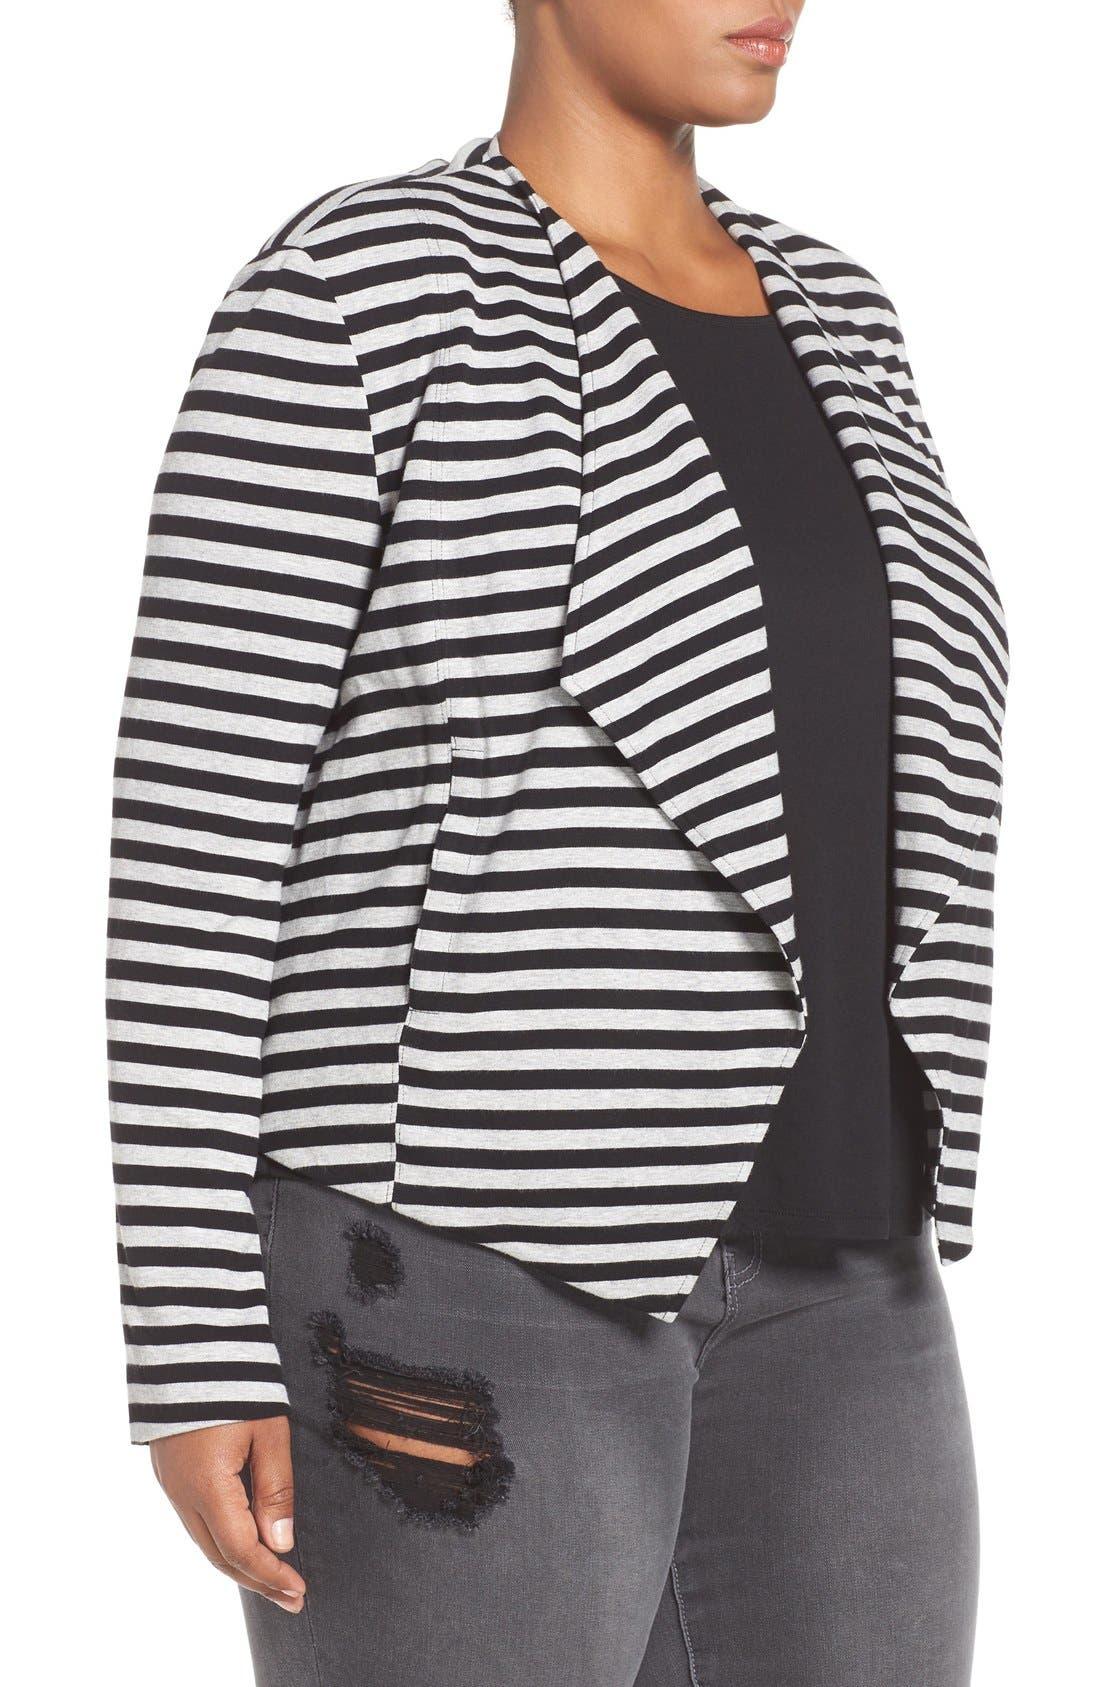 Alternate Image 3  - Tart 'Veronicka' Stripe Knit Open Front Jacket (Plus Size)